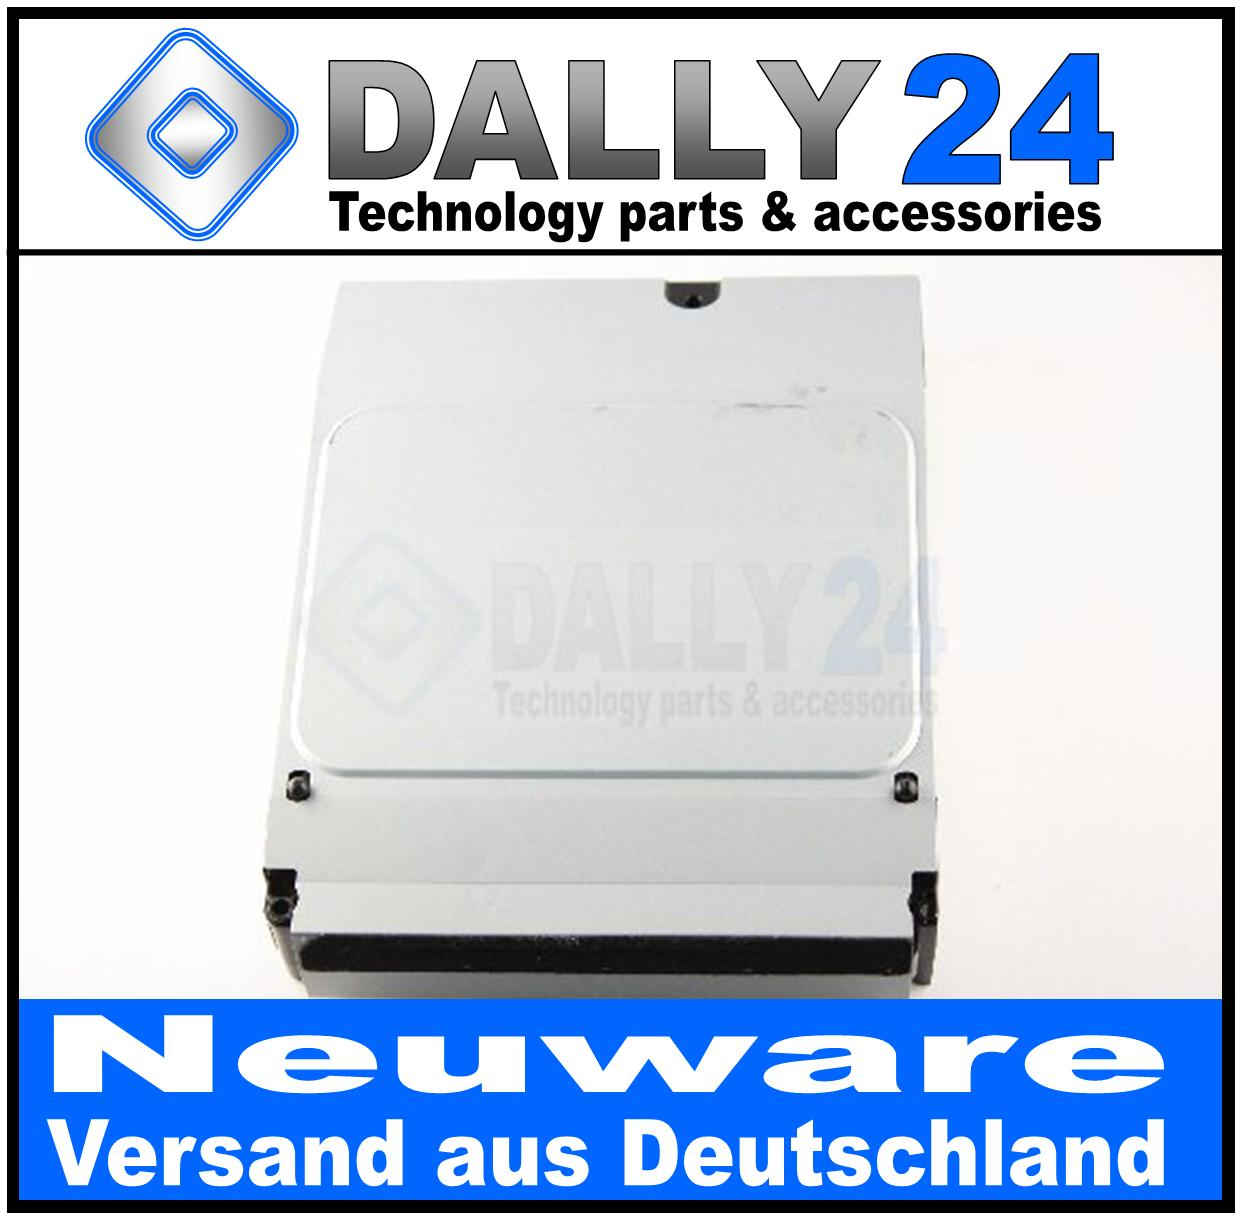 PLAYSTATION-3-ERSATZ-BLUE-RAY-LAUFWERK-410ACA-komplett-inkl-Torx-Platine